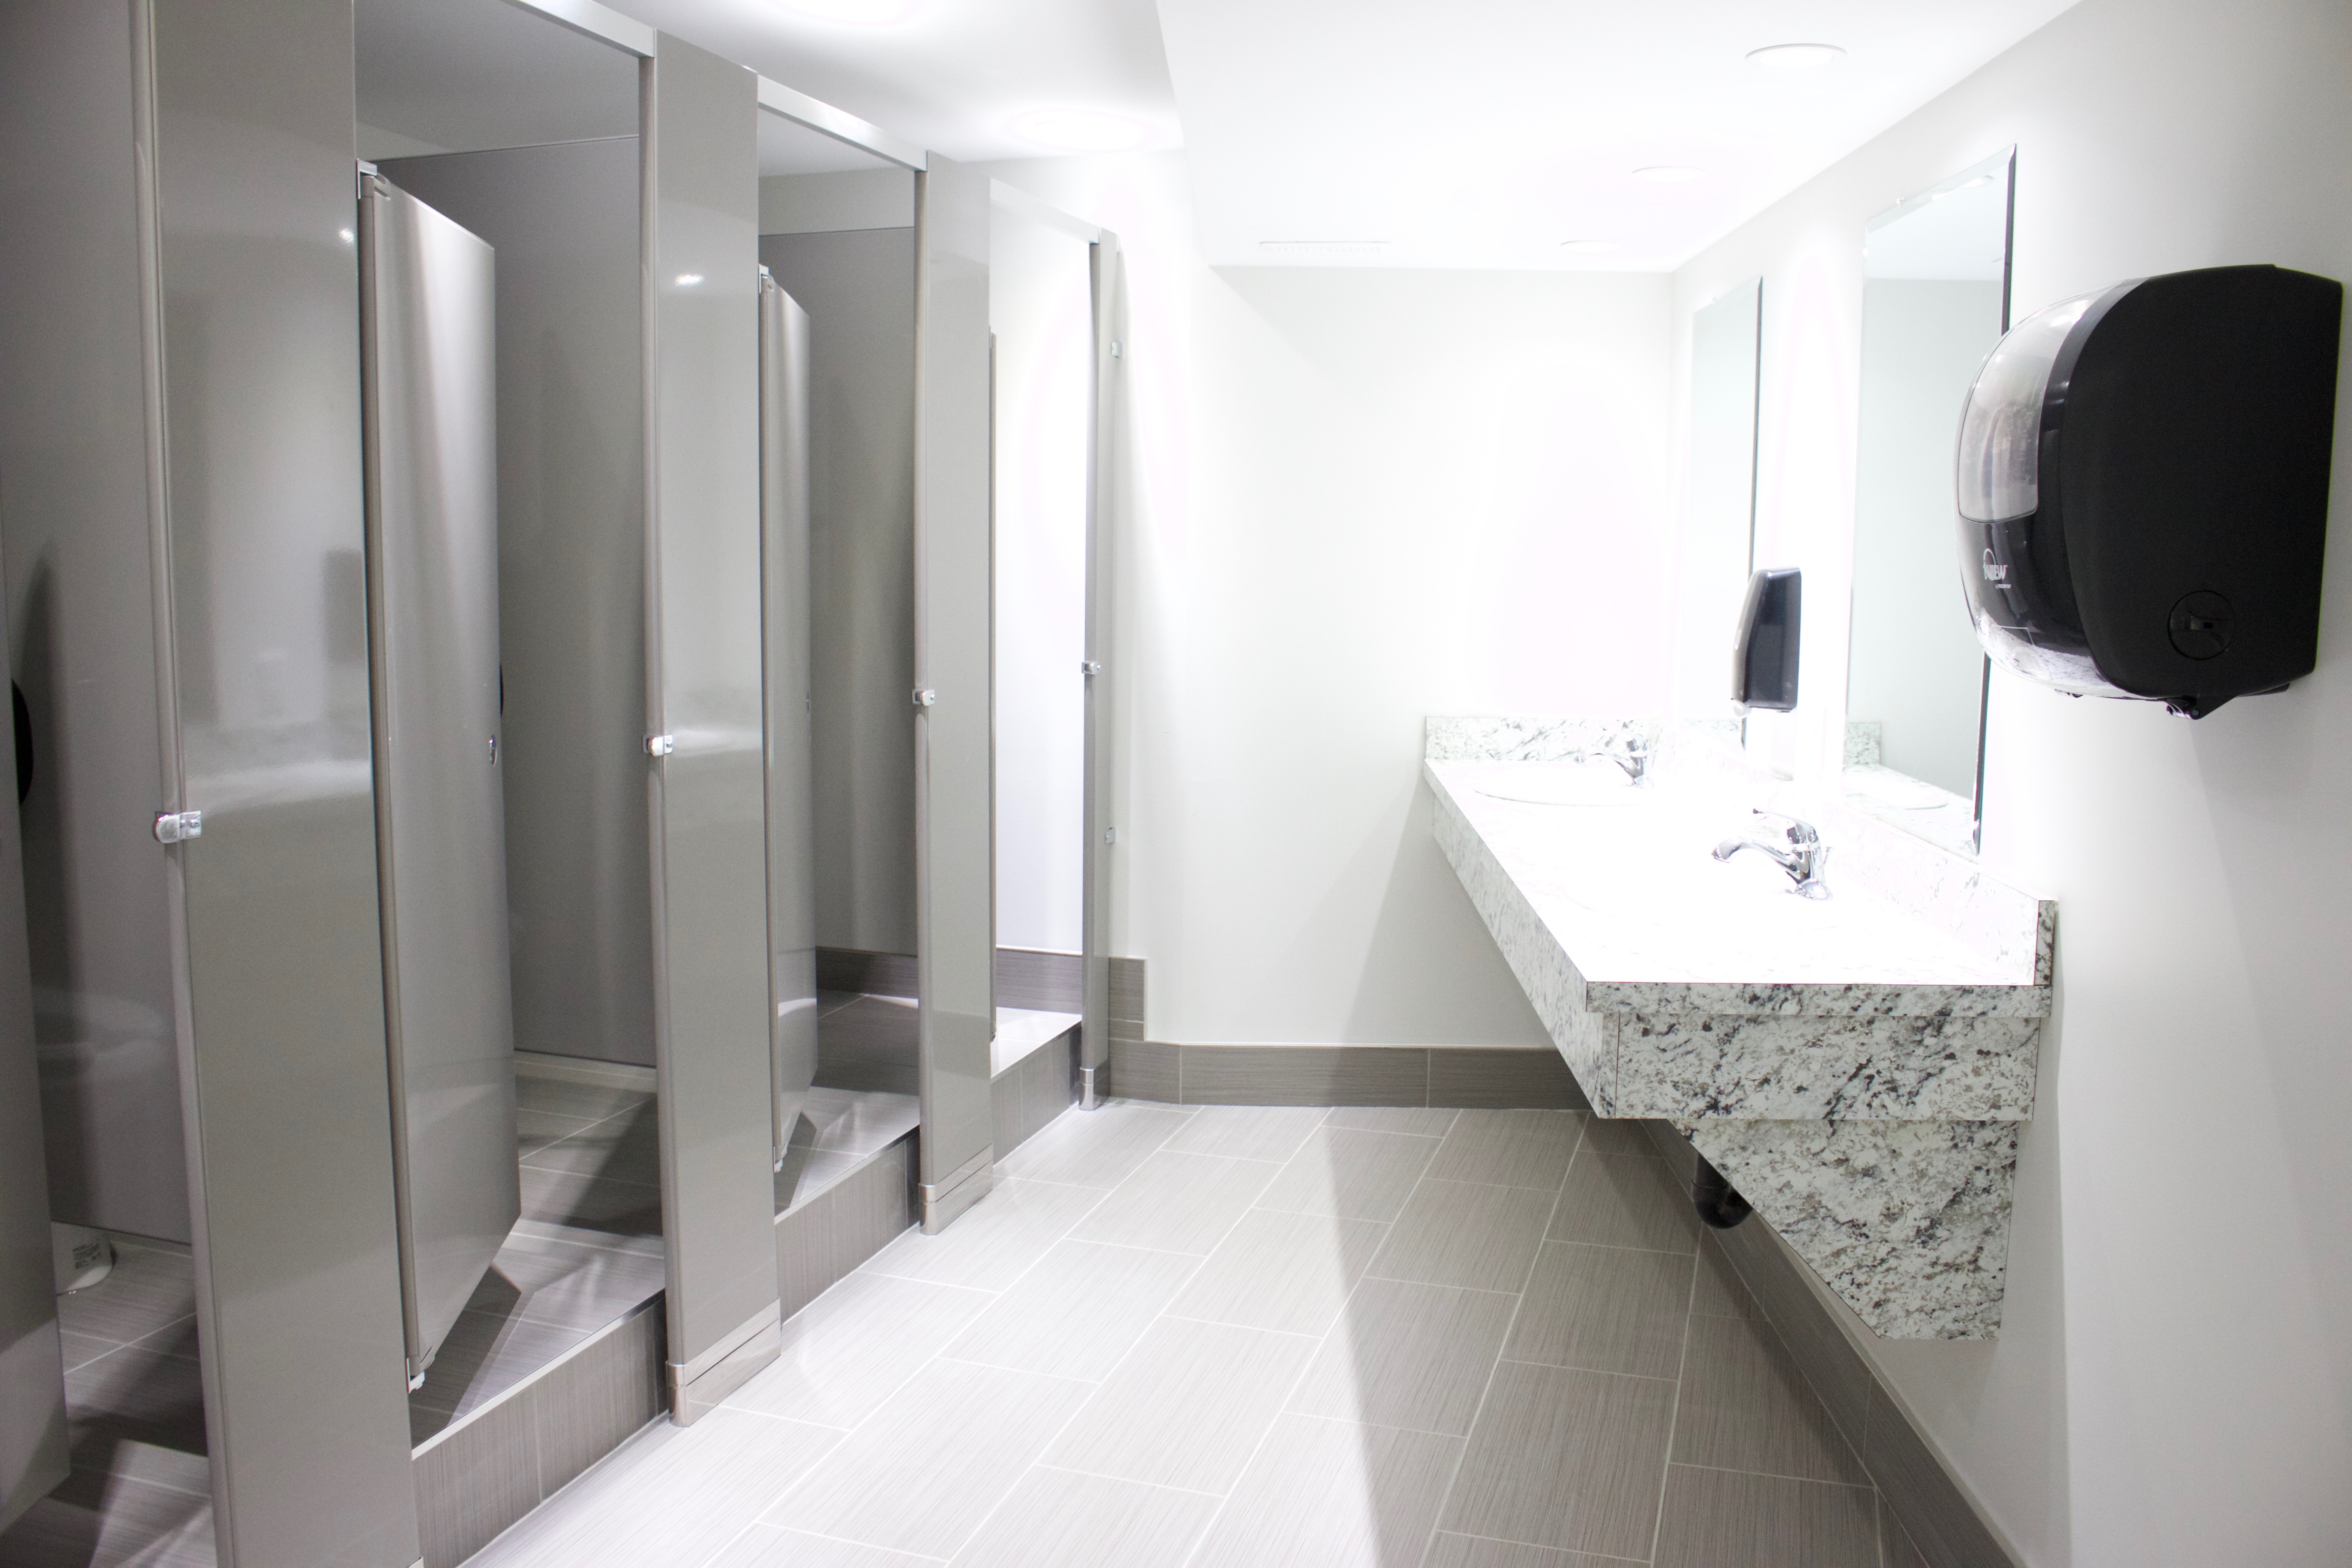 Chap Bathroom